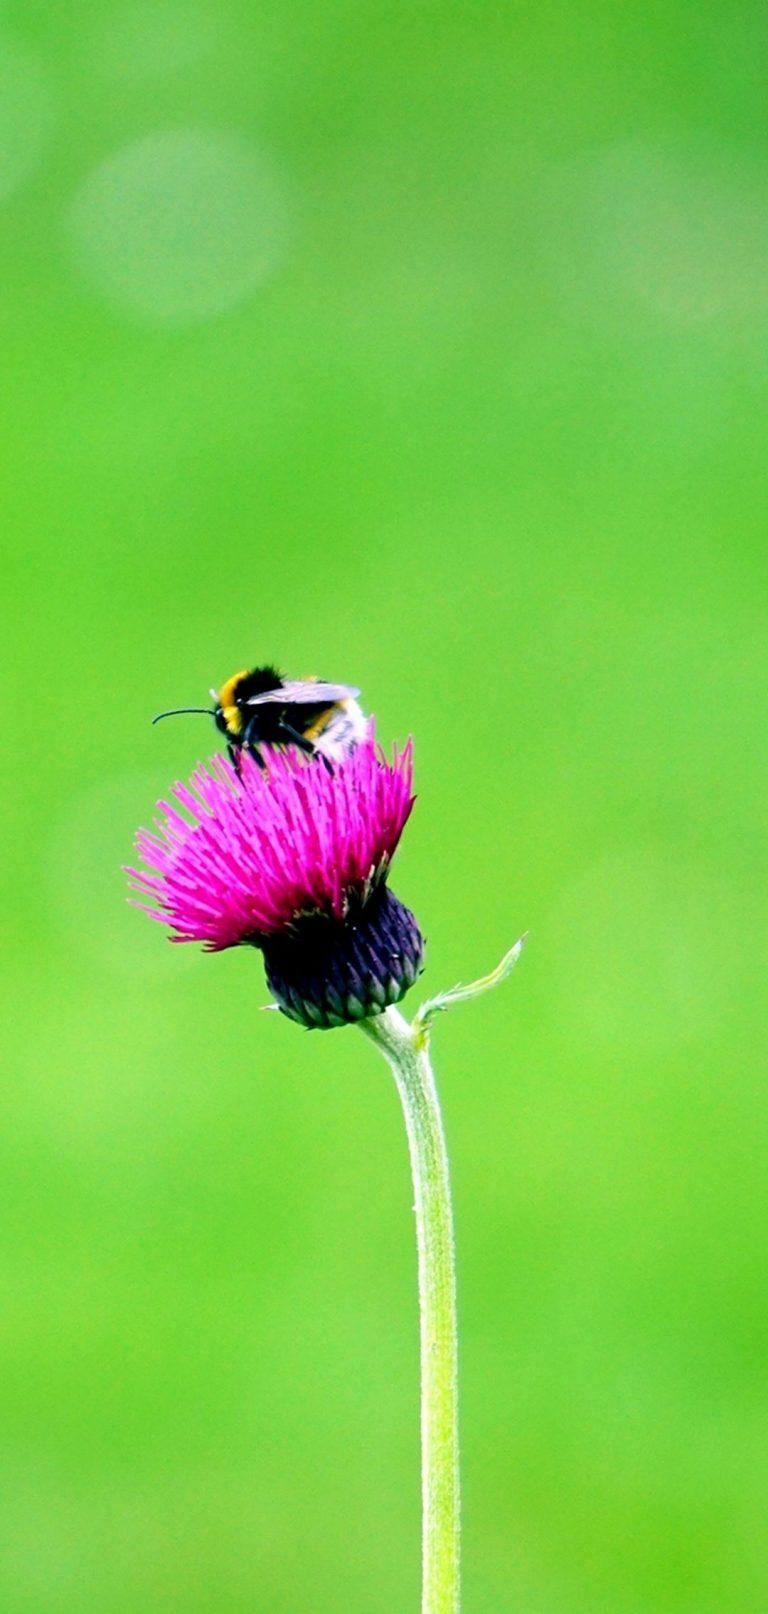 Flower Bee Macro Bud 1080x2270 768x1614